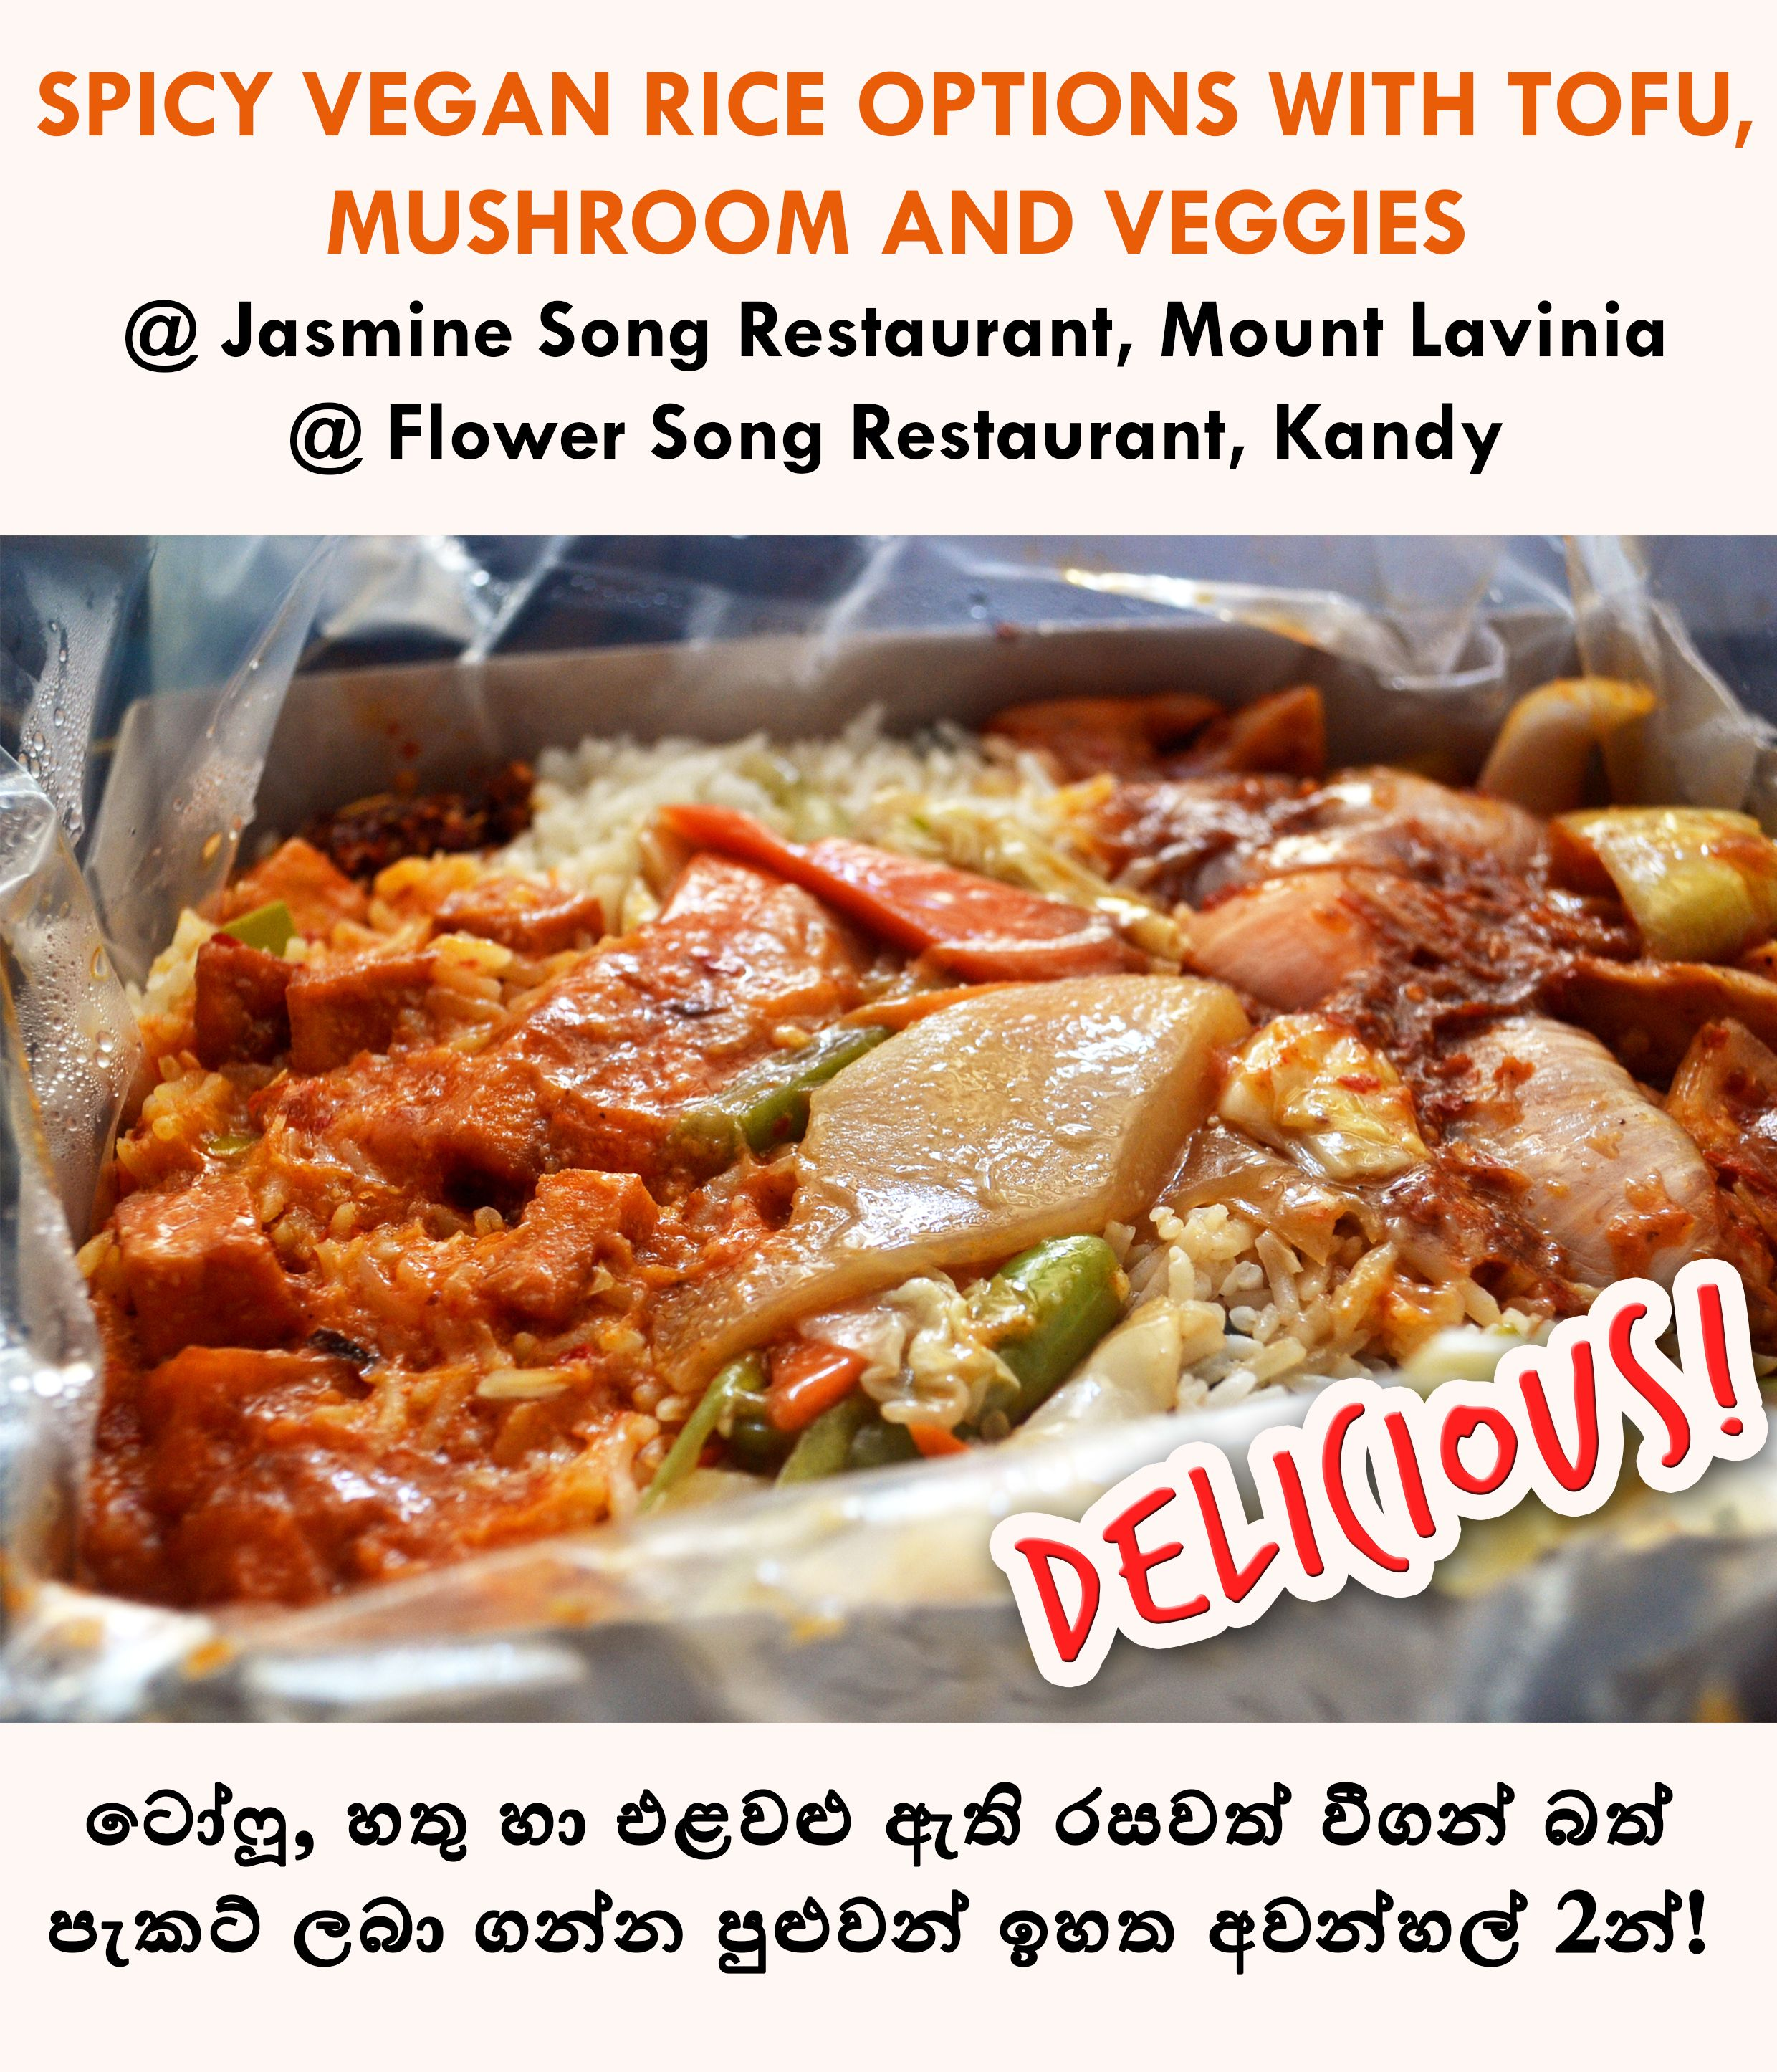 Pin On Where To Get Vegan Food ව ගන ක ම ගත හ ක ත න